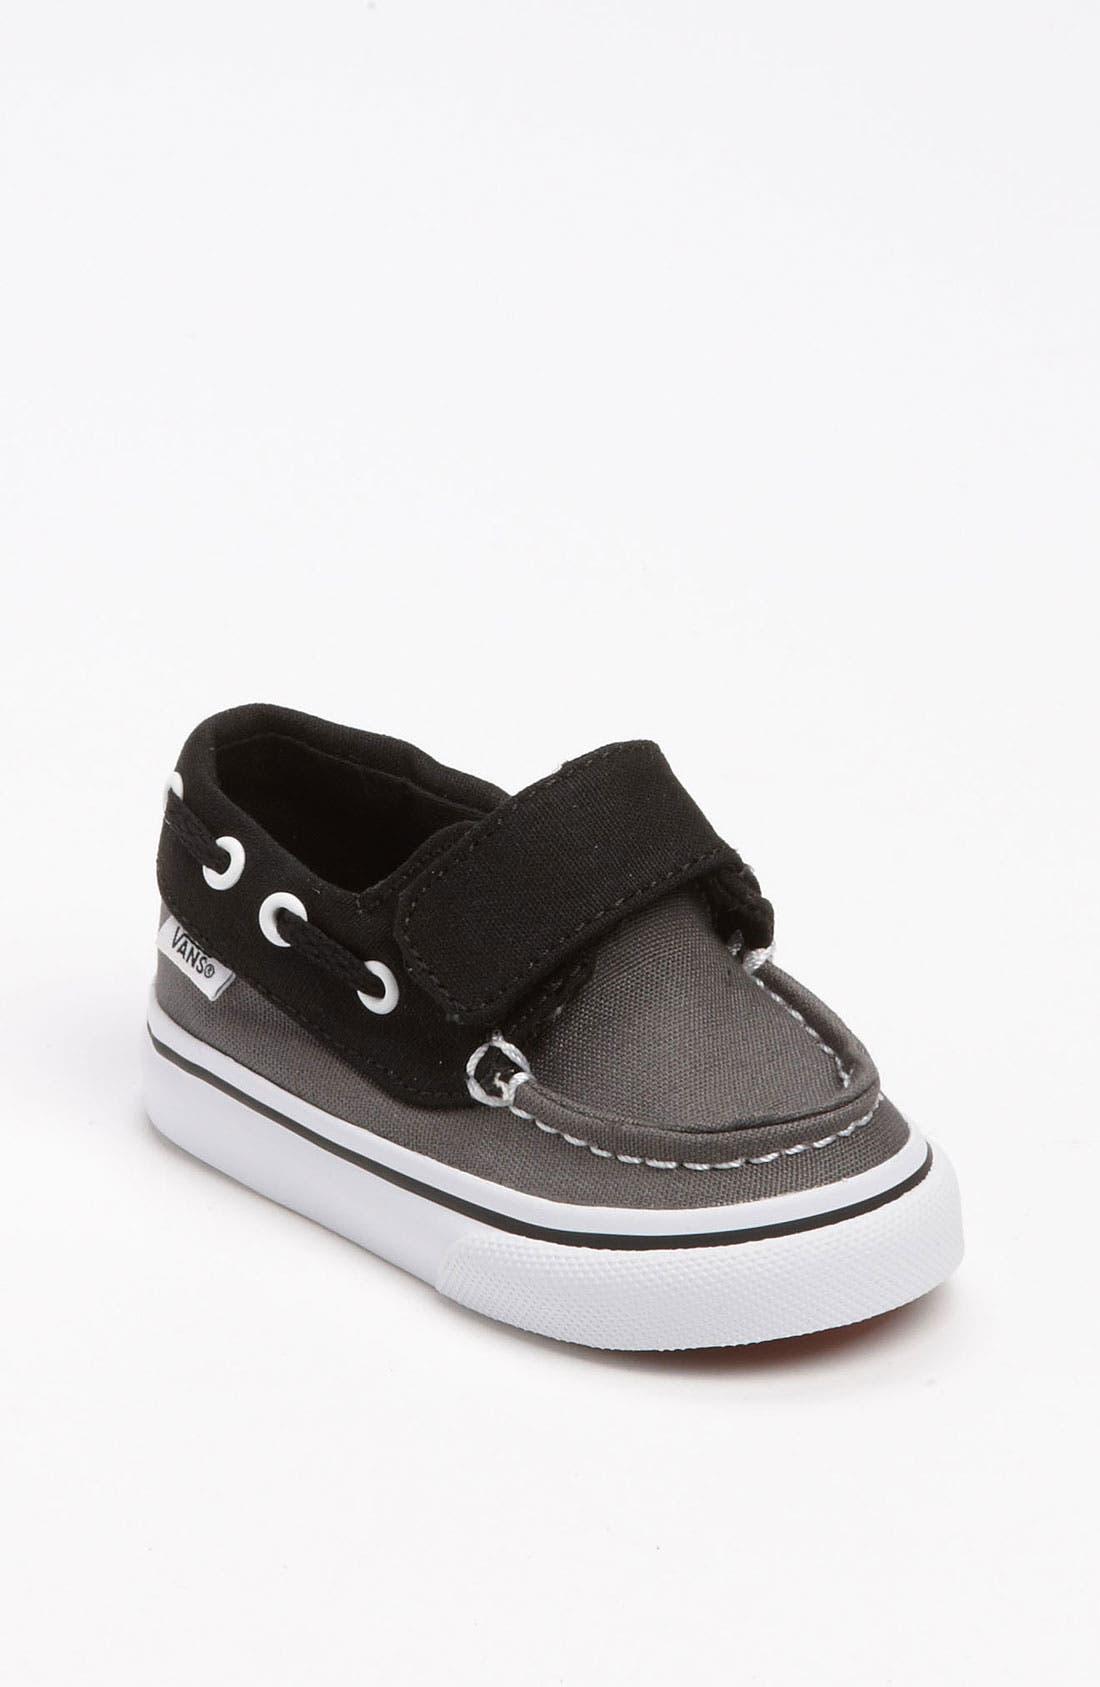 'Zapato del Barco V' Boat Shoe,                             Main thumbnail 1, color,                             020